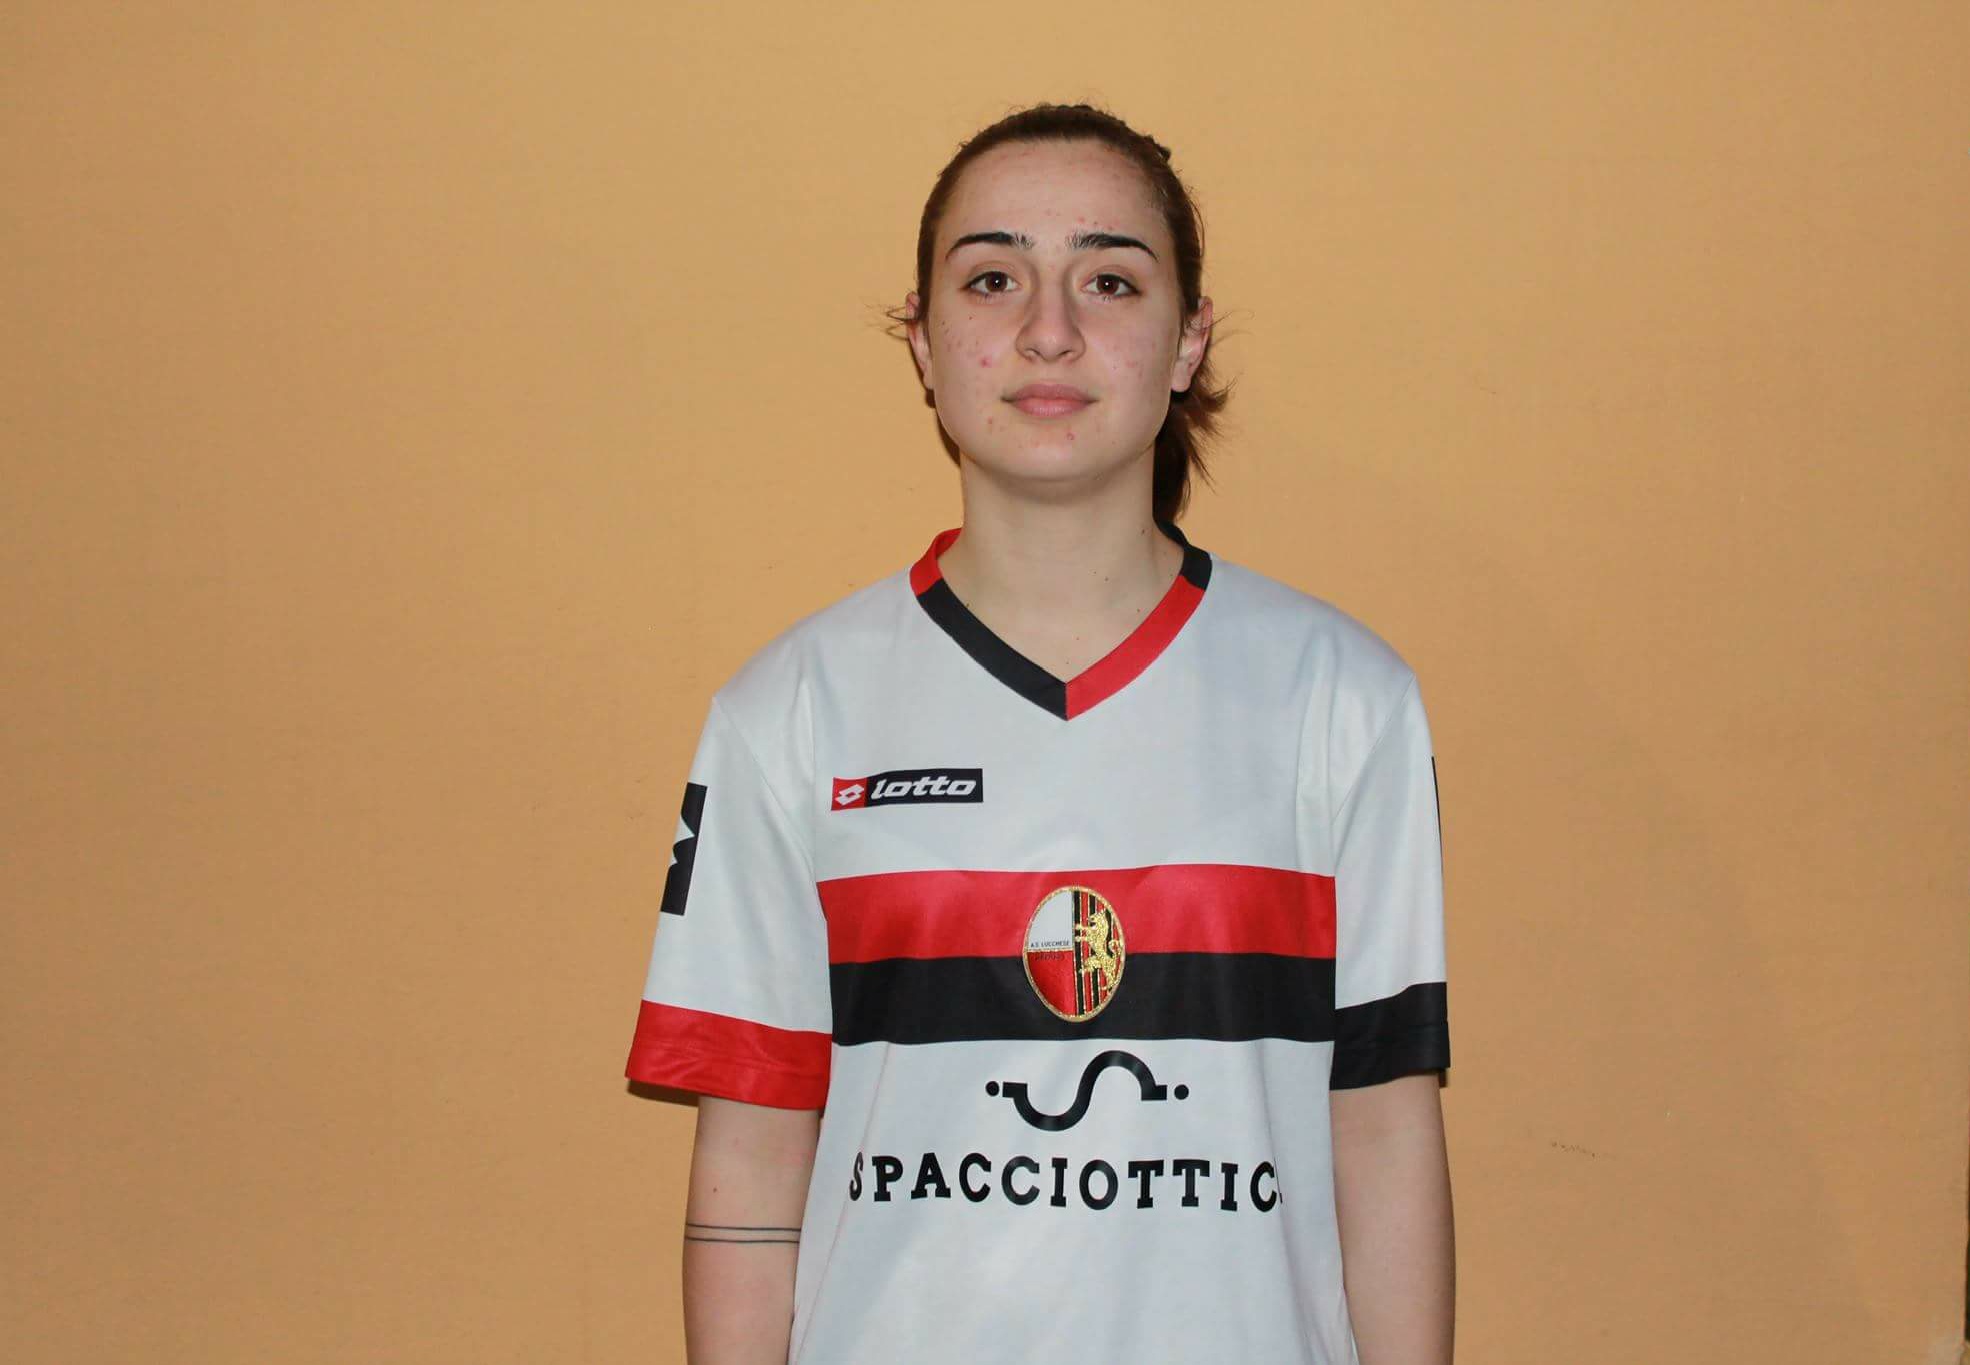 Lega Pro: Tuttocuoio rimontato in casa. Lucchese ok in extremis, pari Livorno